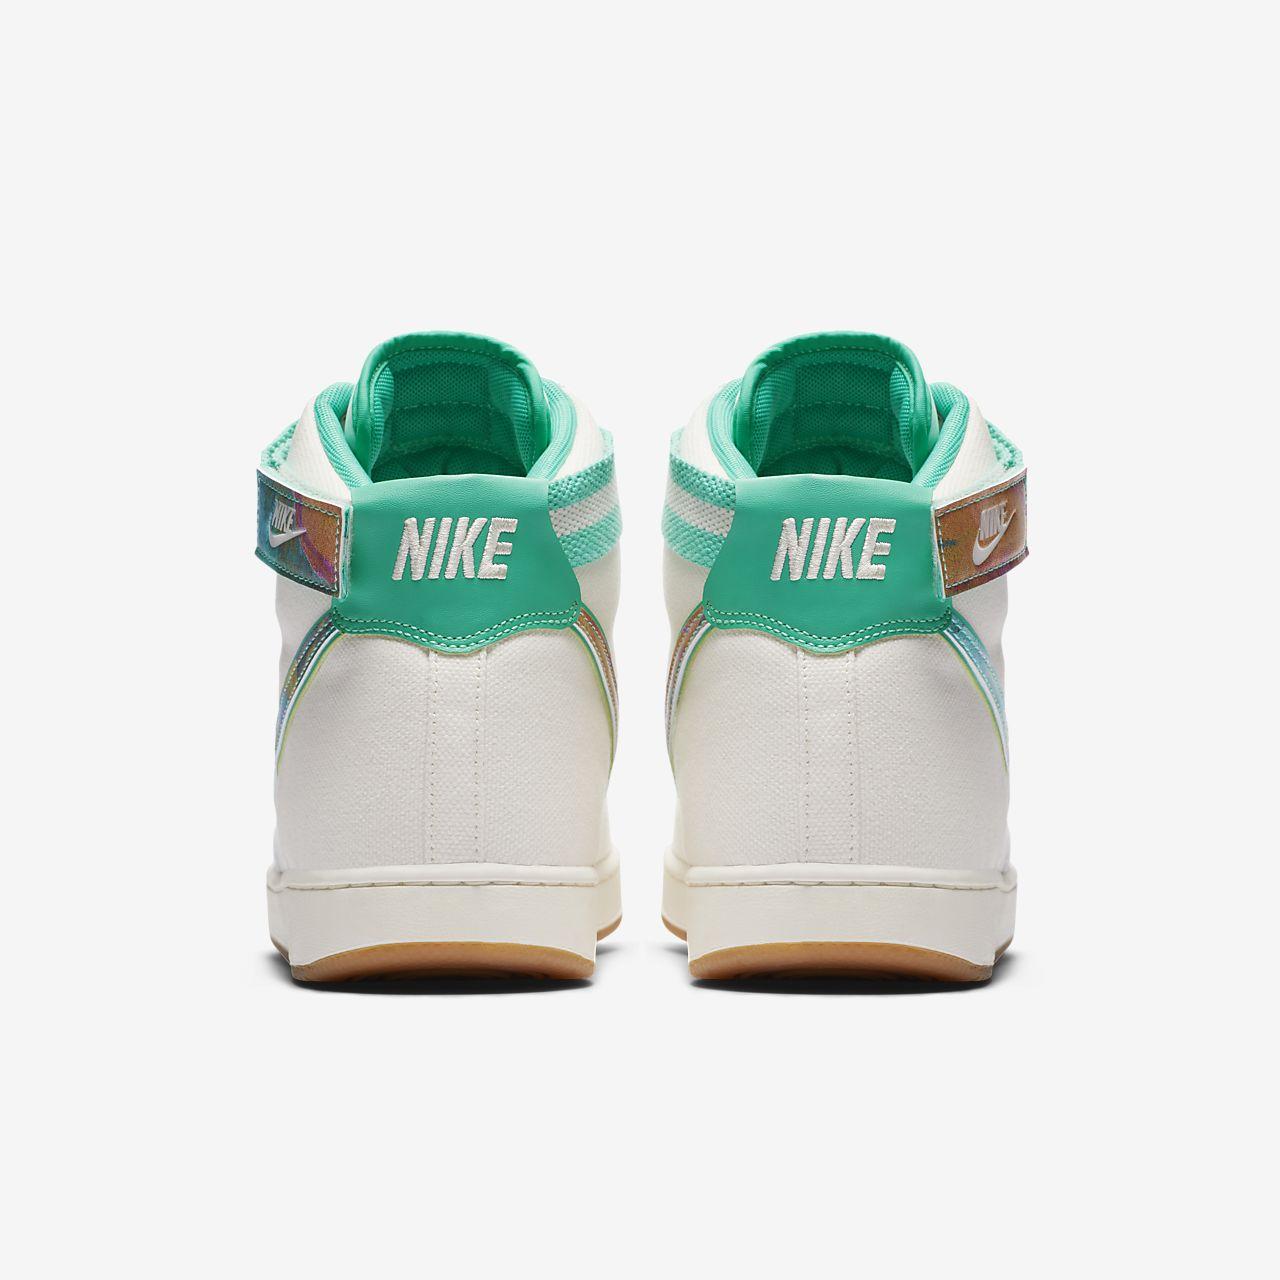 ... Nike Vandal High Supreme TD Men's Shoe